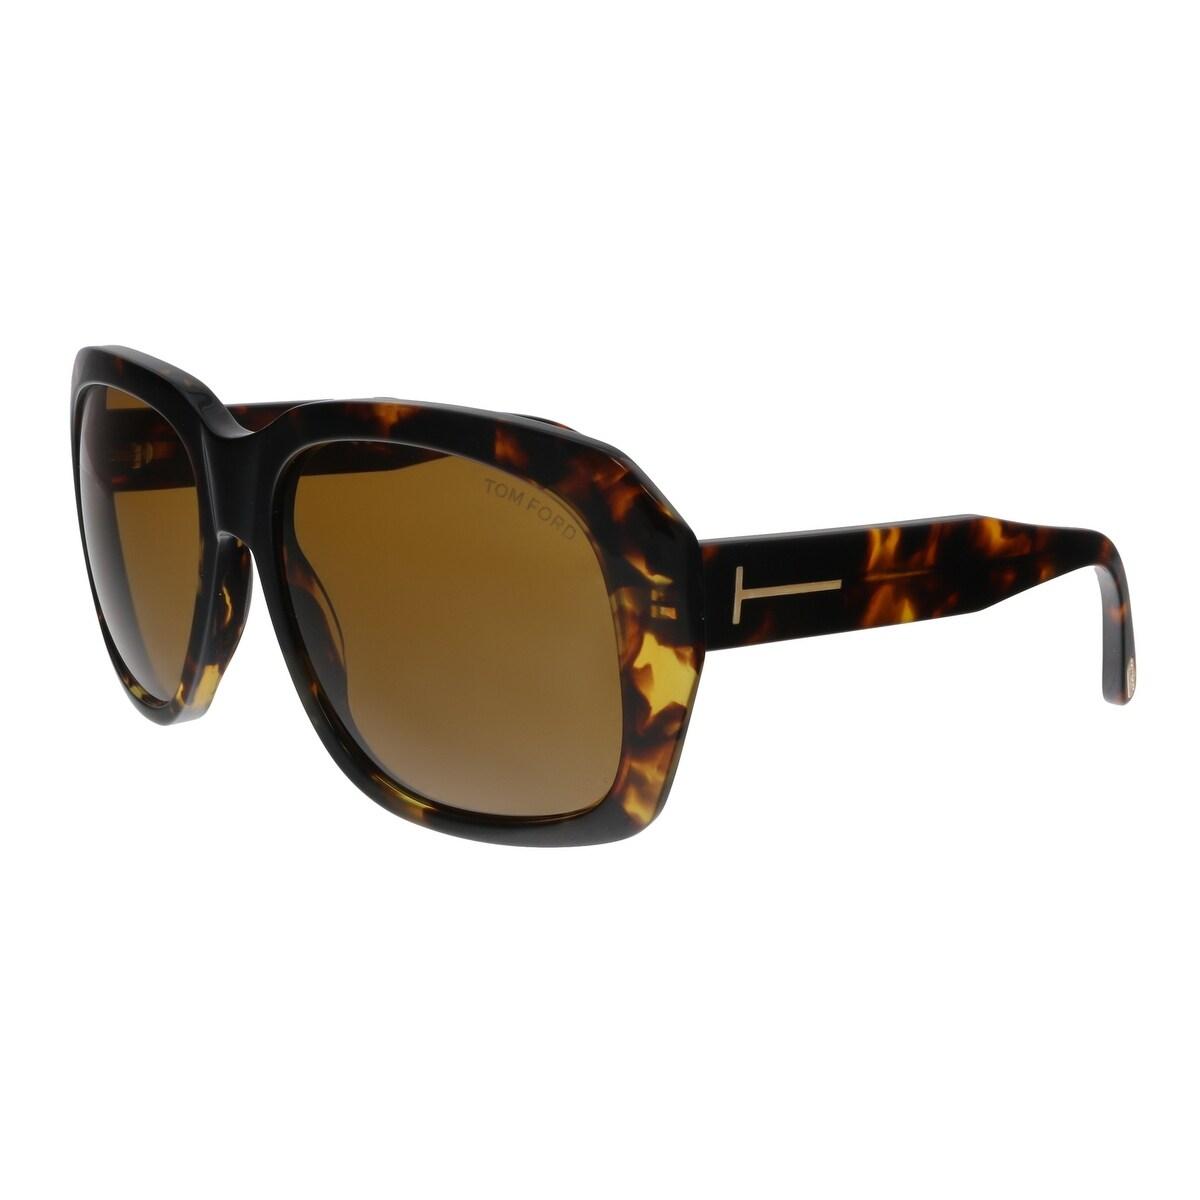 a4c957ebb1c Shop Tom Ford FT0635 52E Andre-02 Havana Square Sunglasses - No Size ...